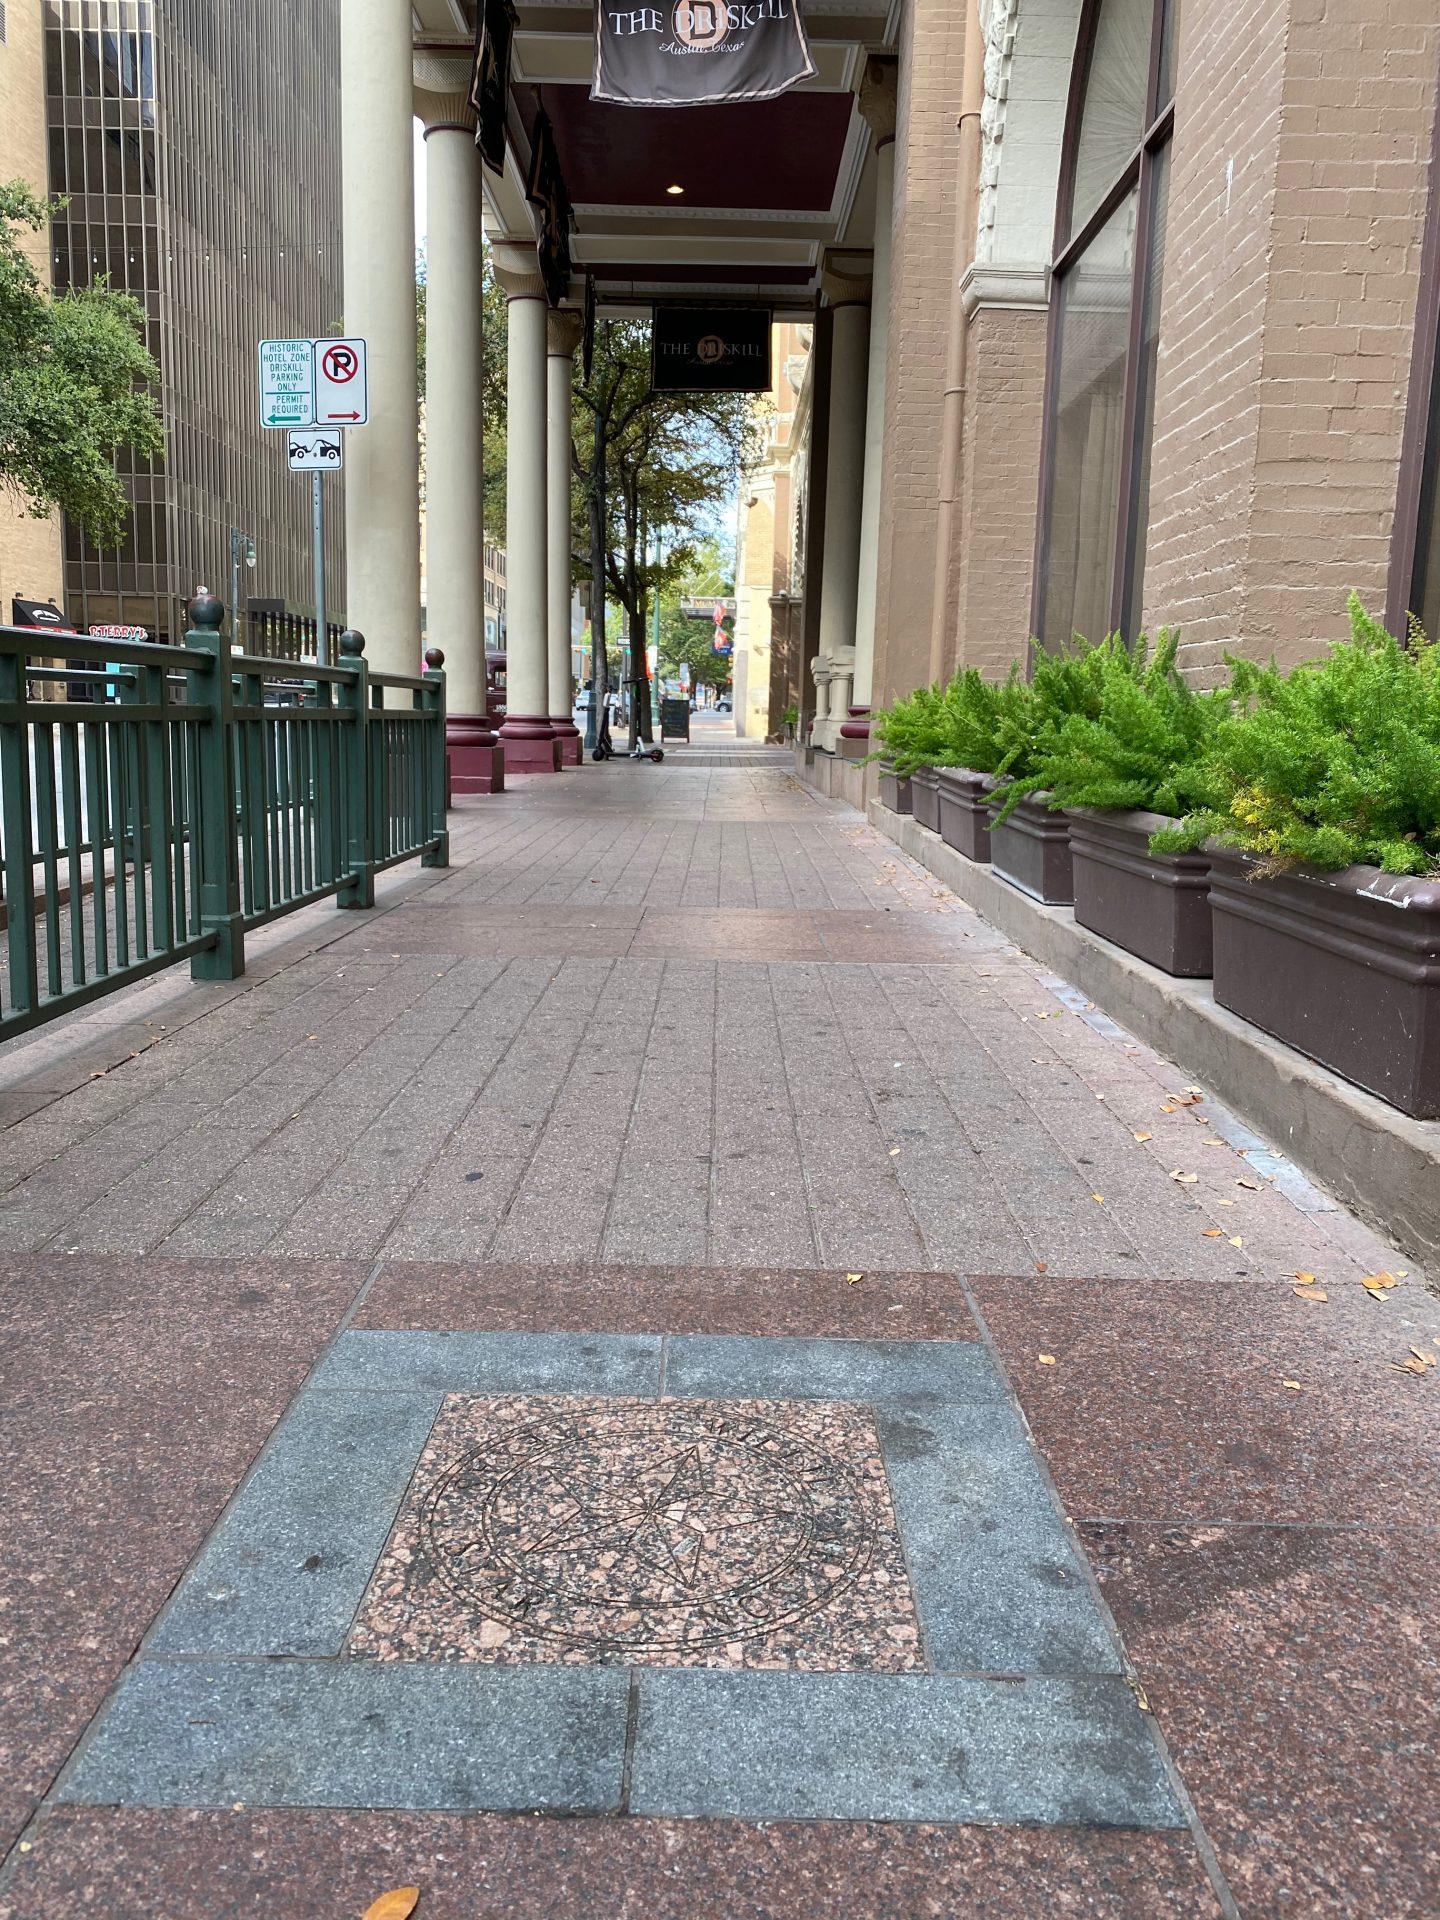 Willie Nelson's star on Texas Walk of Stars